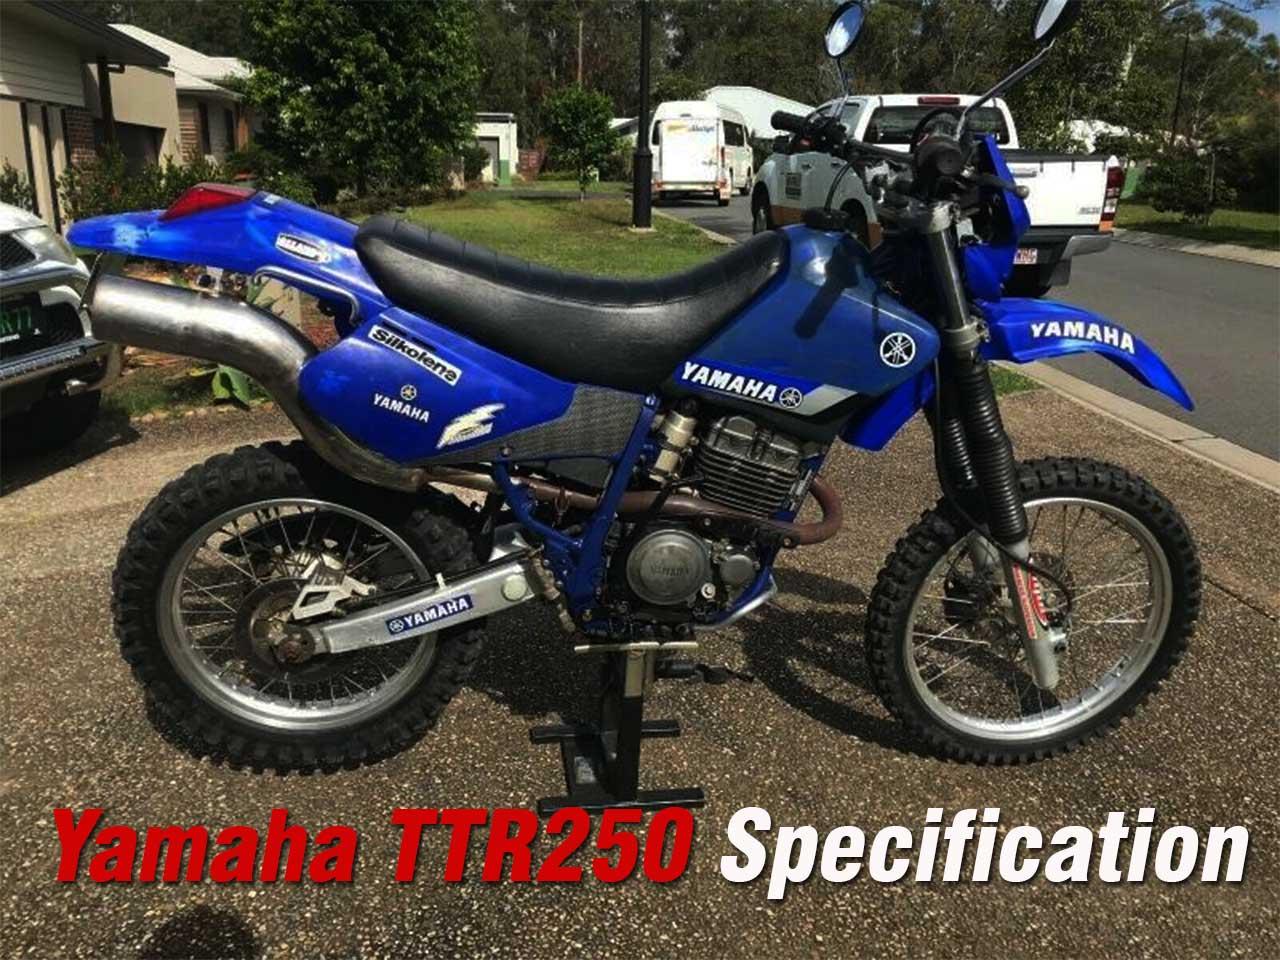 Yamaha TTR250 Specs / Specification - Yamaha Old Bikes List